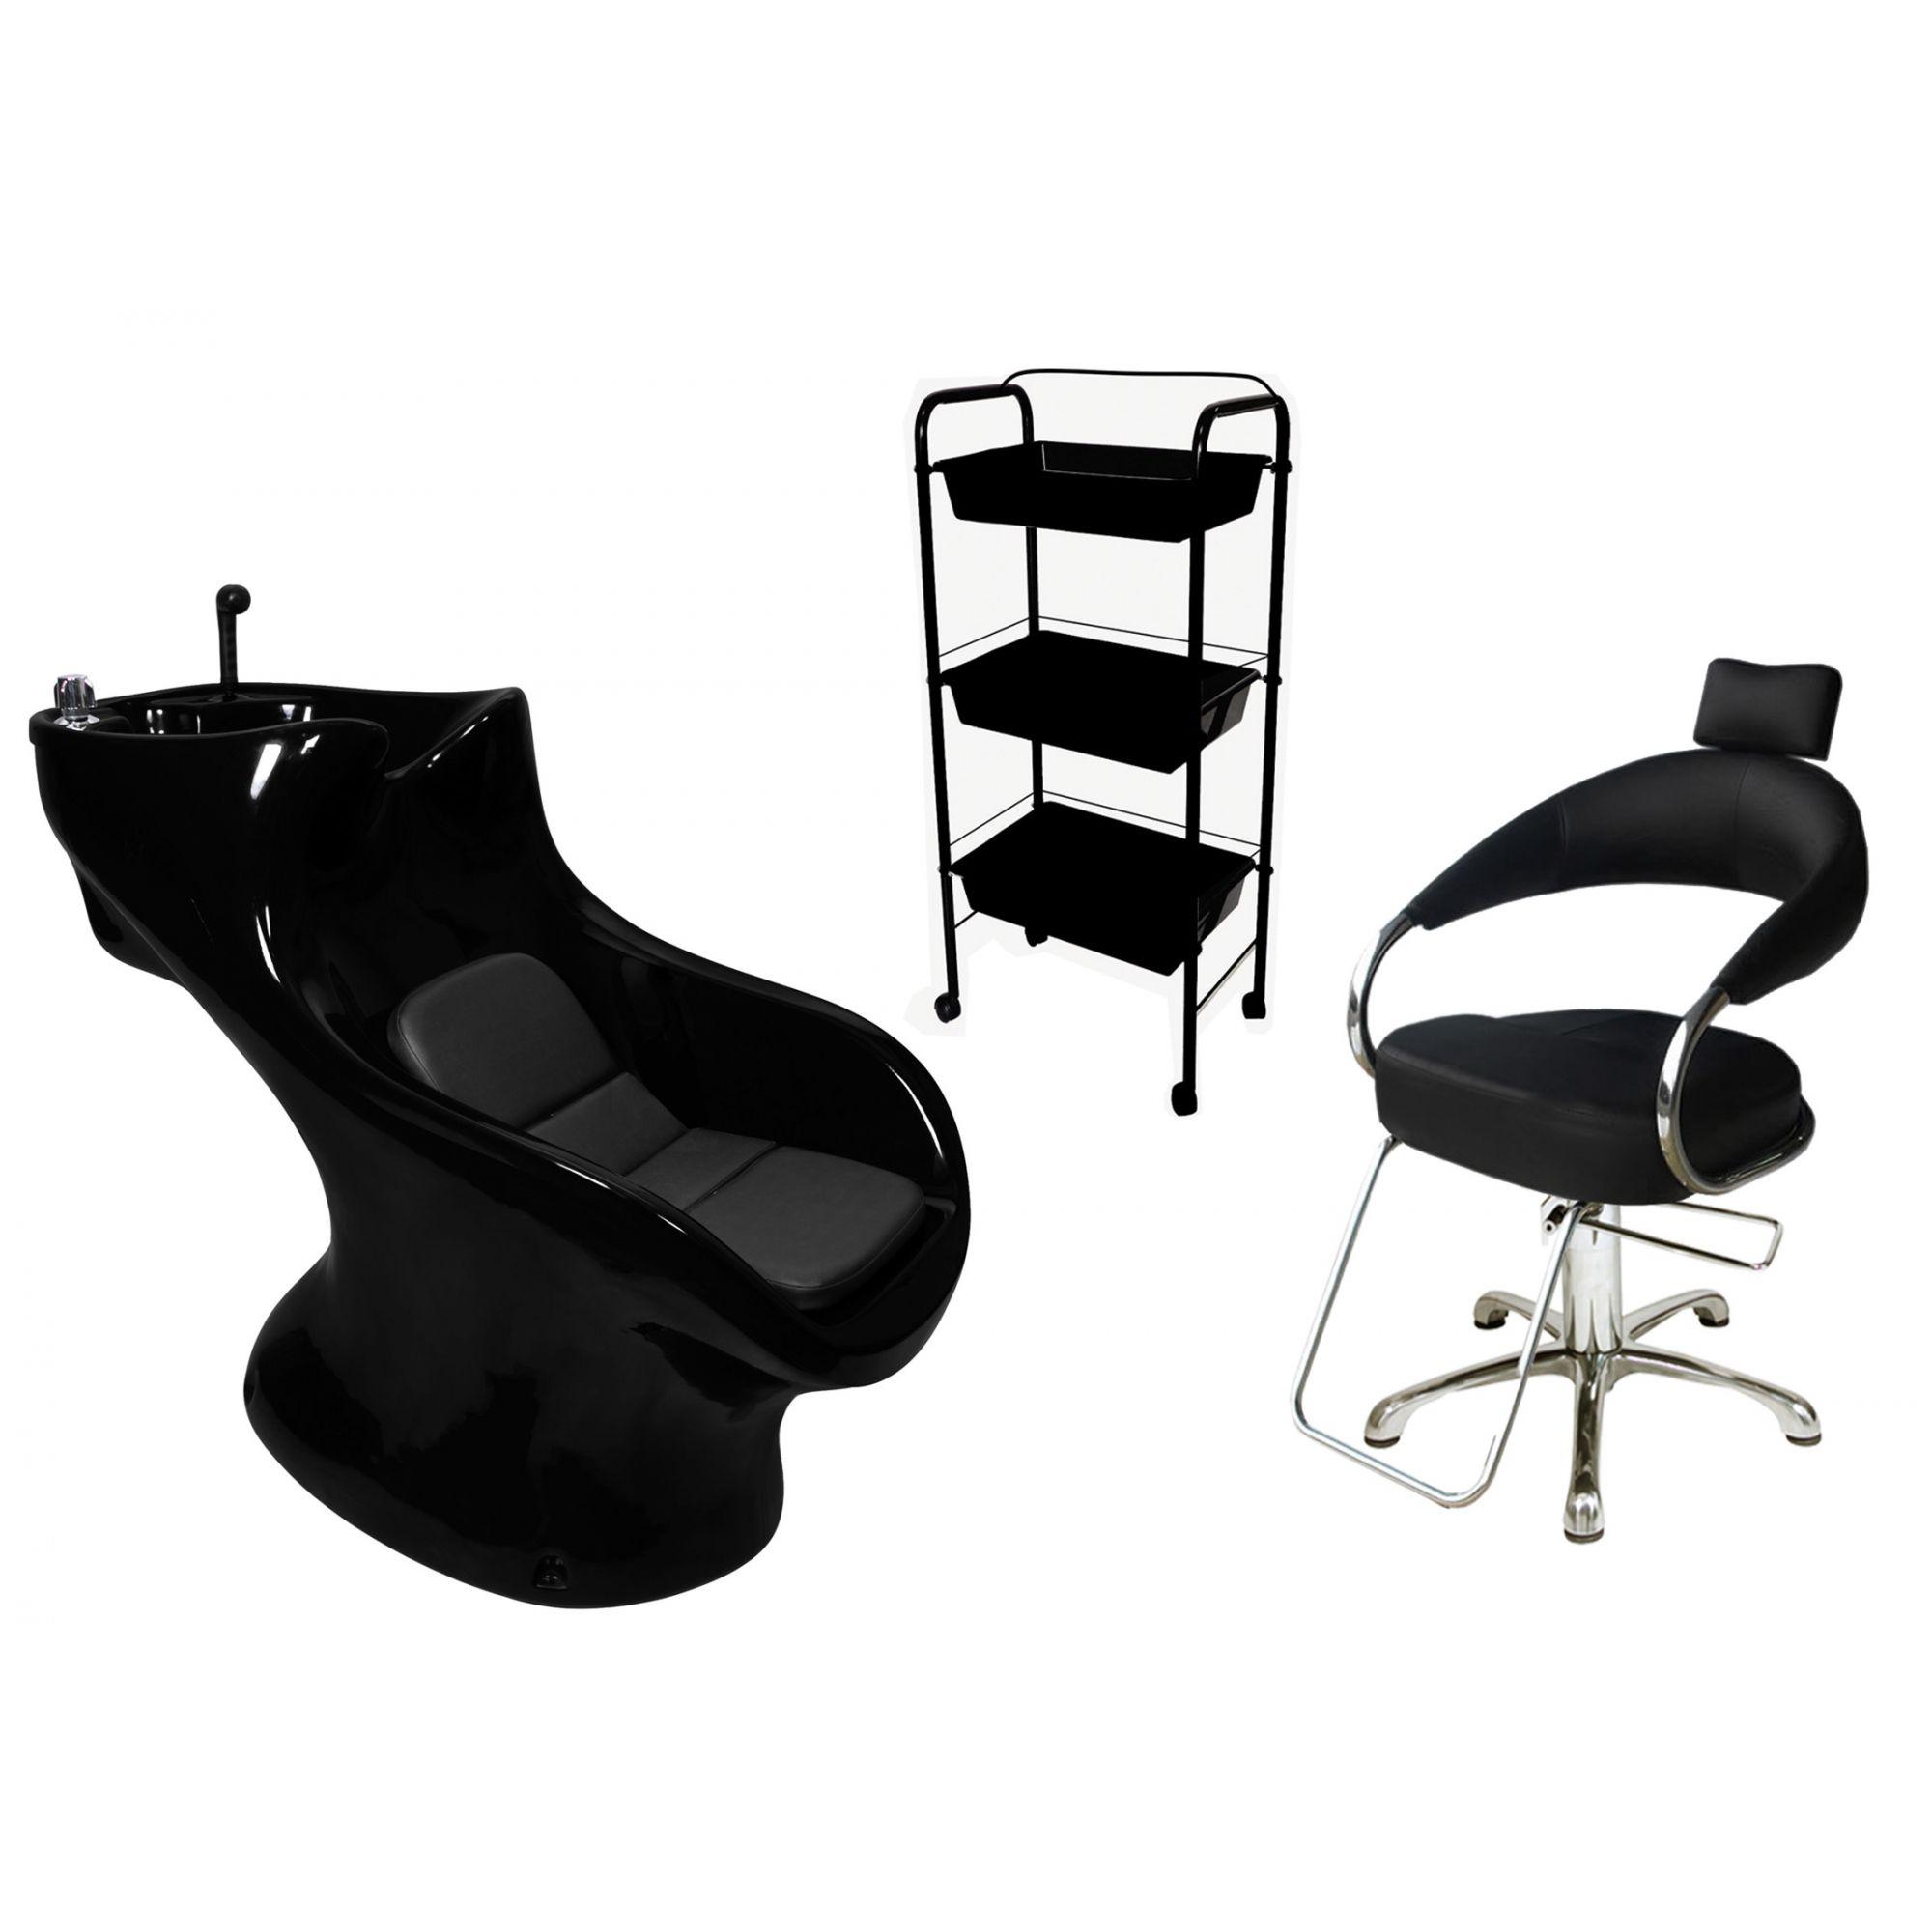 Lavatório Star Italiano + Cadeira Hidráulica Futurama + CG3 - BF